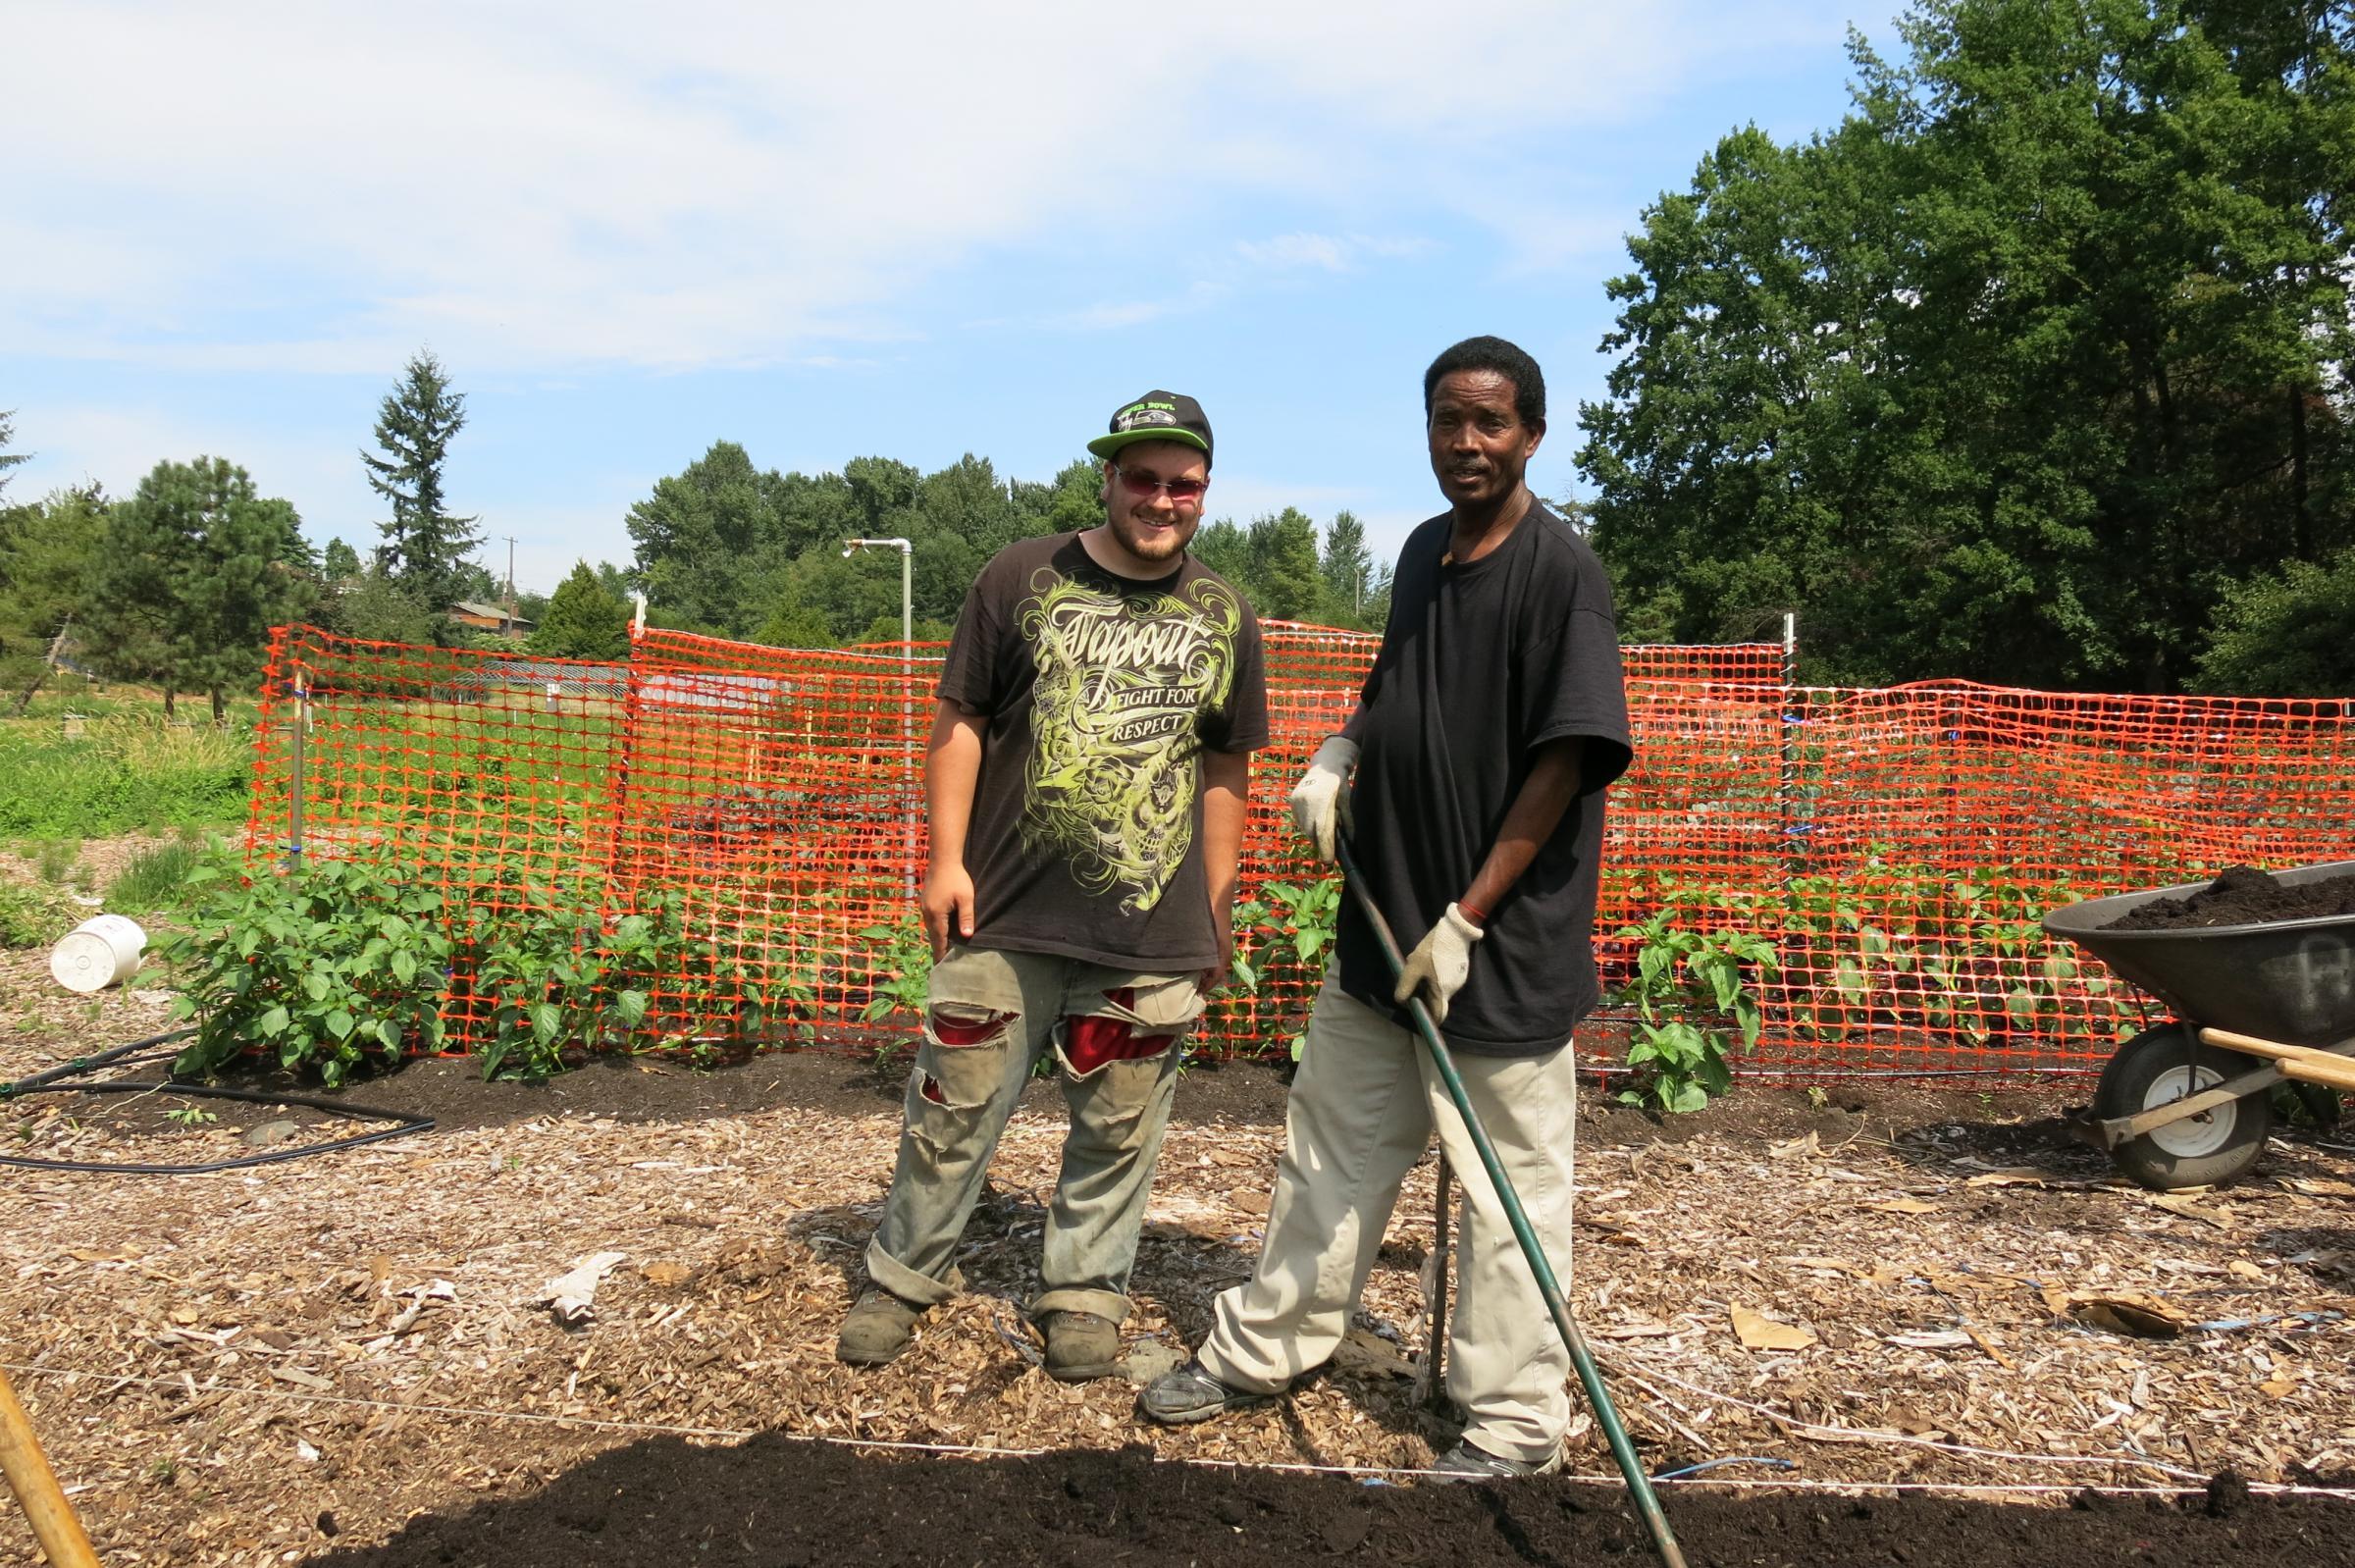 Coty Fitzgerald And Mekonene Bihon Take A Break From Raking The Soil At  Rainier Beach Urban Farm And Wetlands On Friday, Aug. 1, 2014.